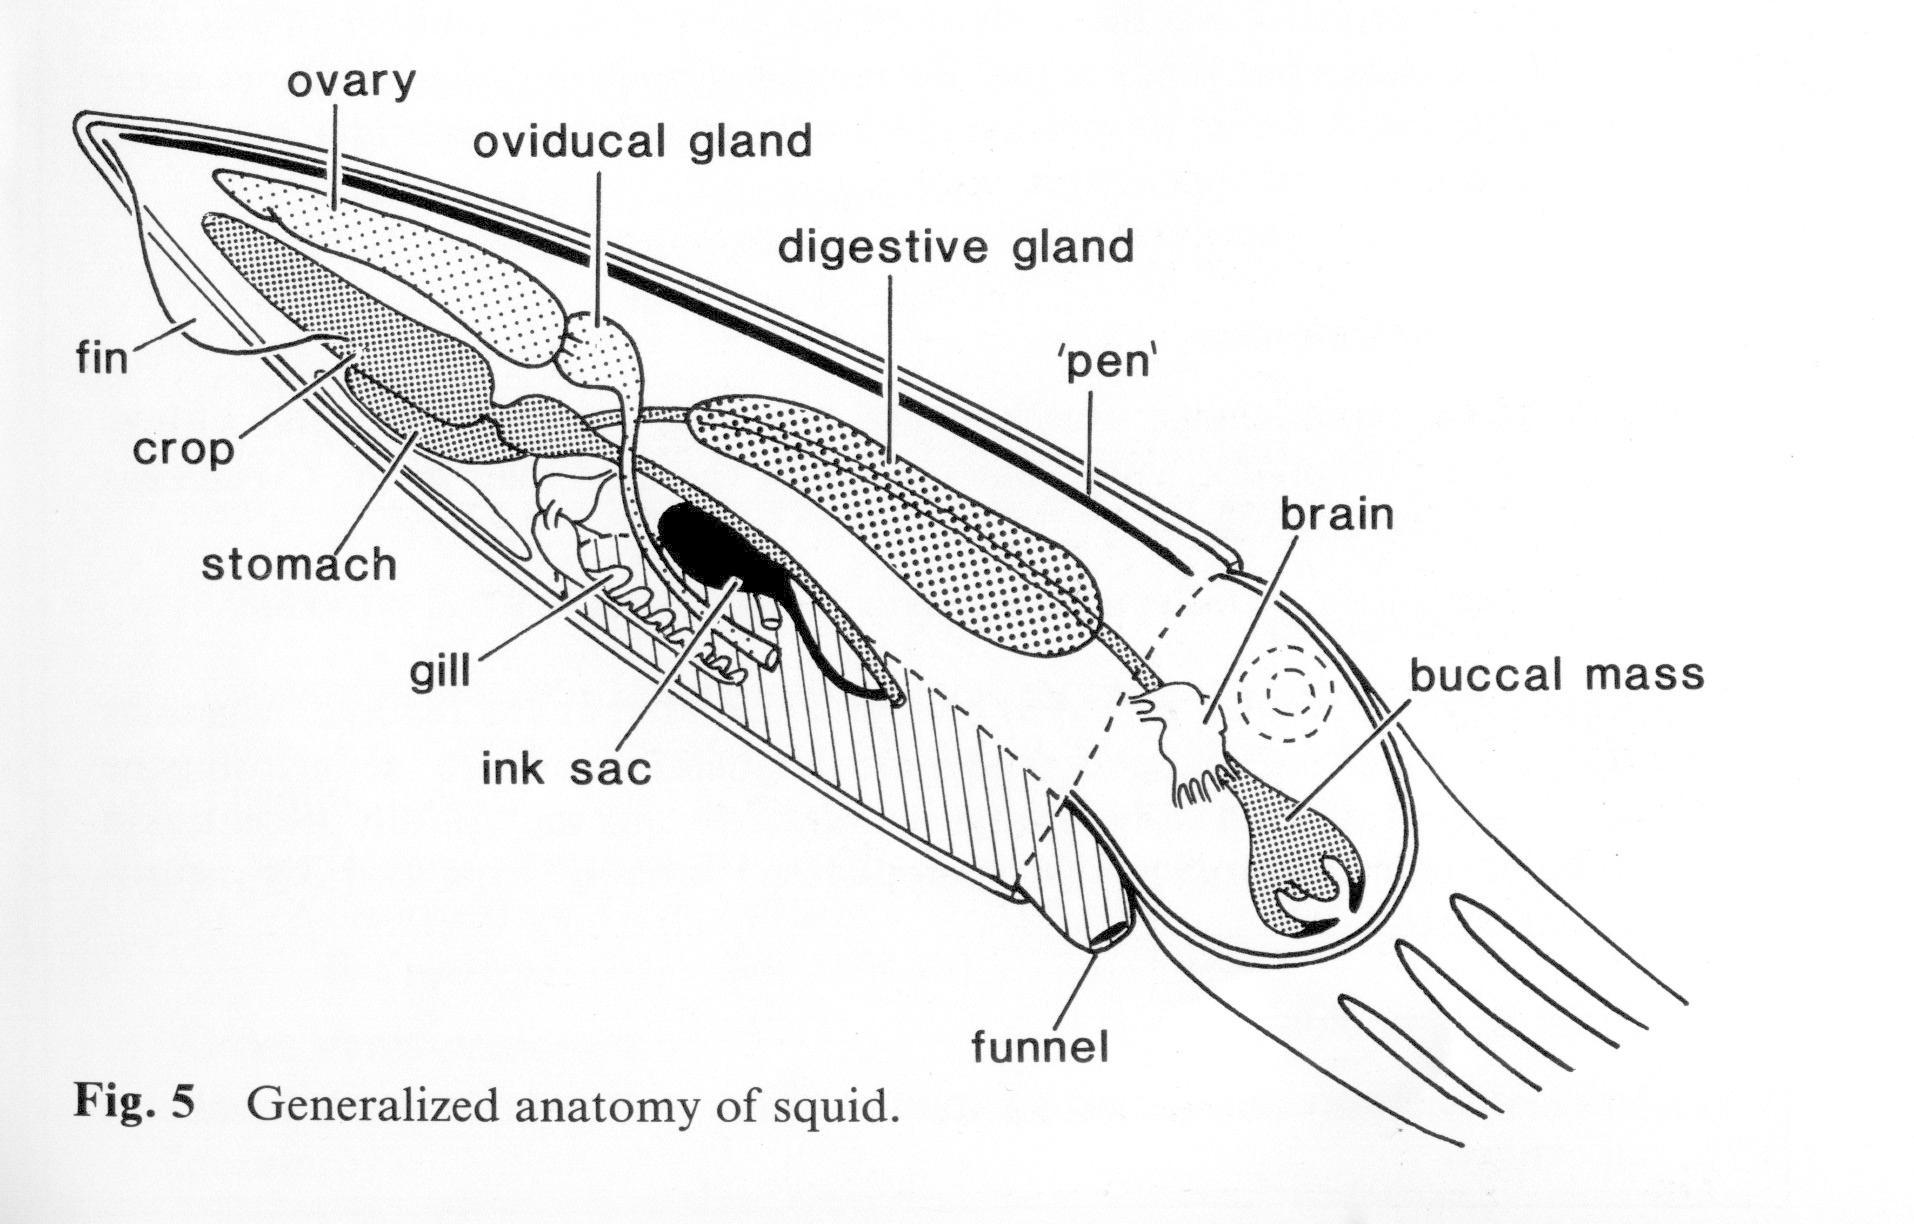 mollusca diagram labeled ford escape 2006 radio wiring biology presentation pptx by fikhrykiki96 on emaze